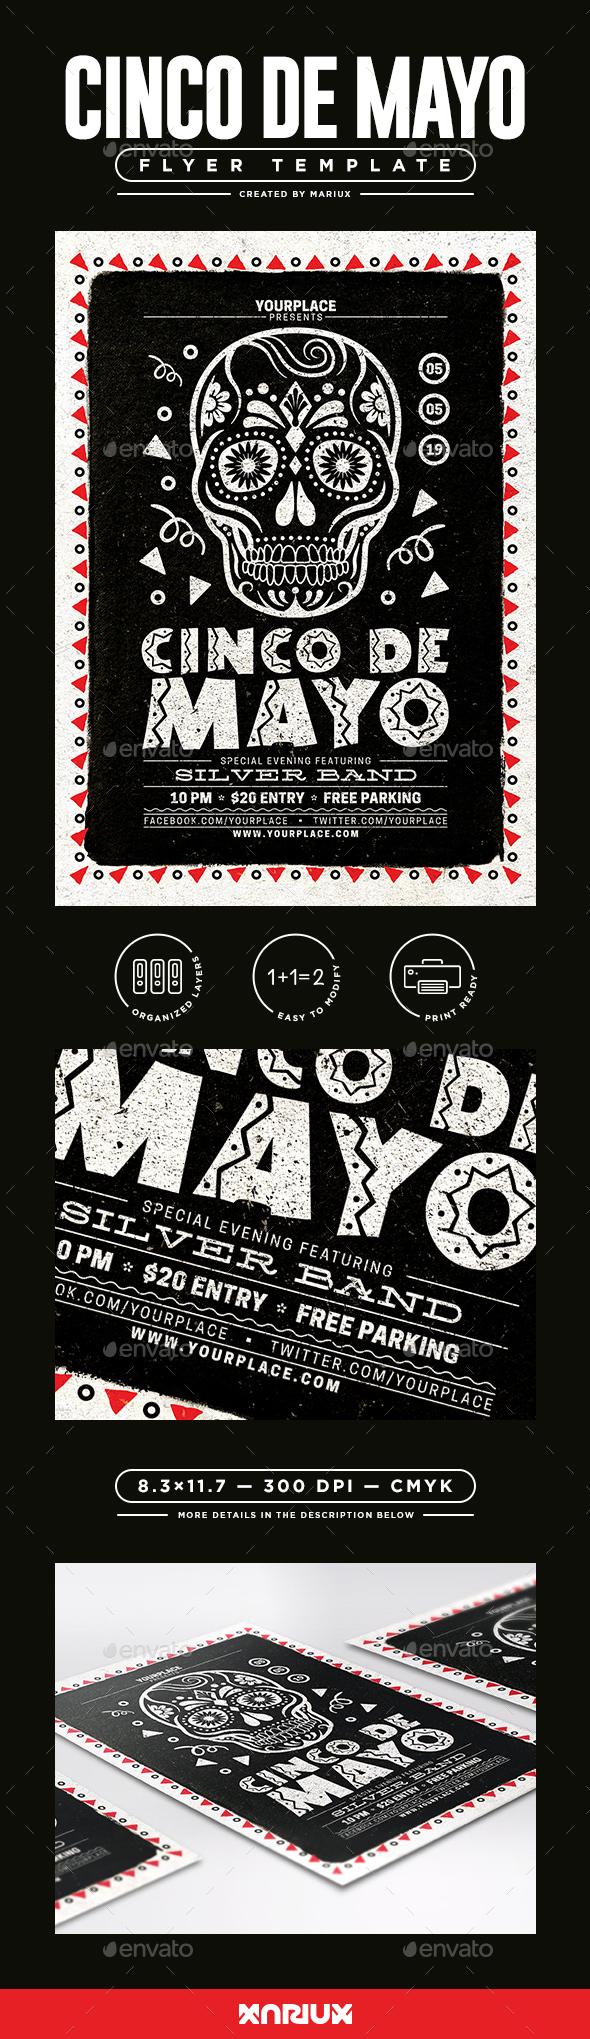 Cinco de Mayo Flyer/Poster - Events Flyers